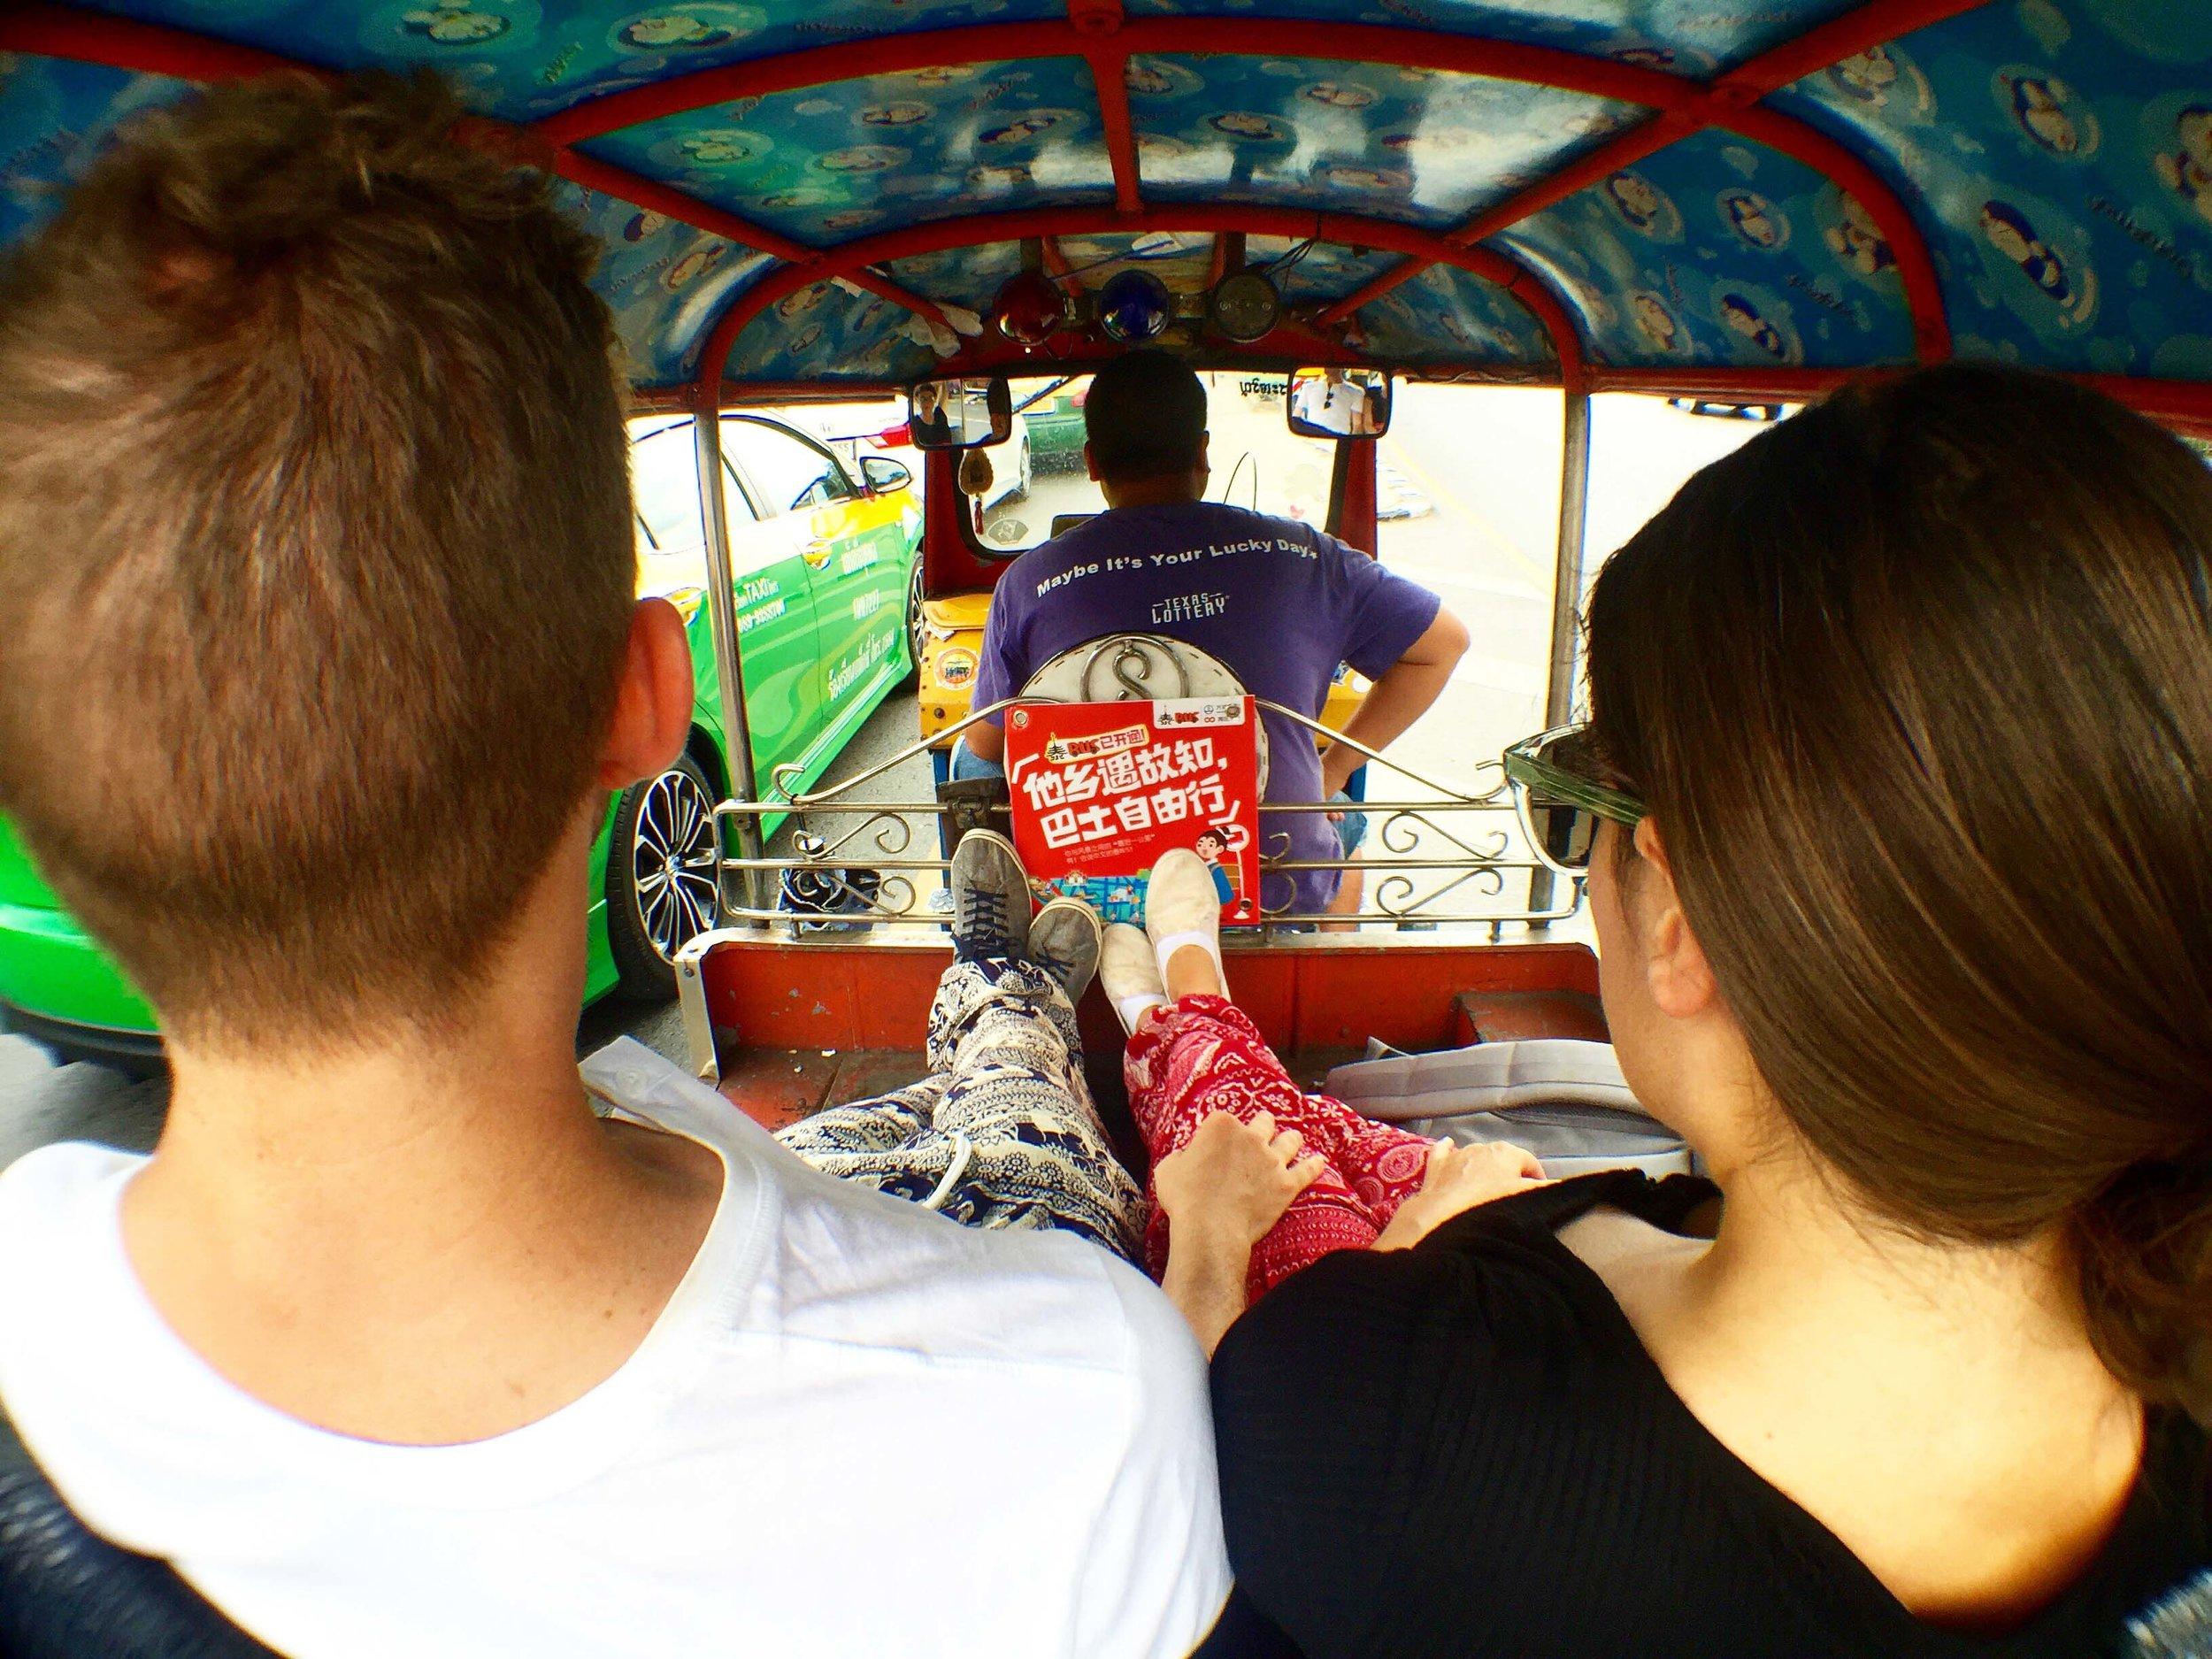 Wondering how to get around Bangkok? Tuk-tuks are a fun way to travel